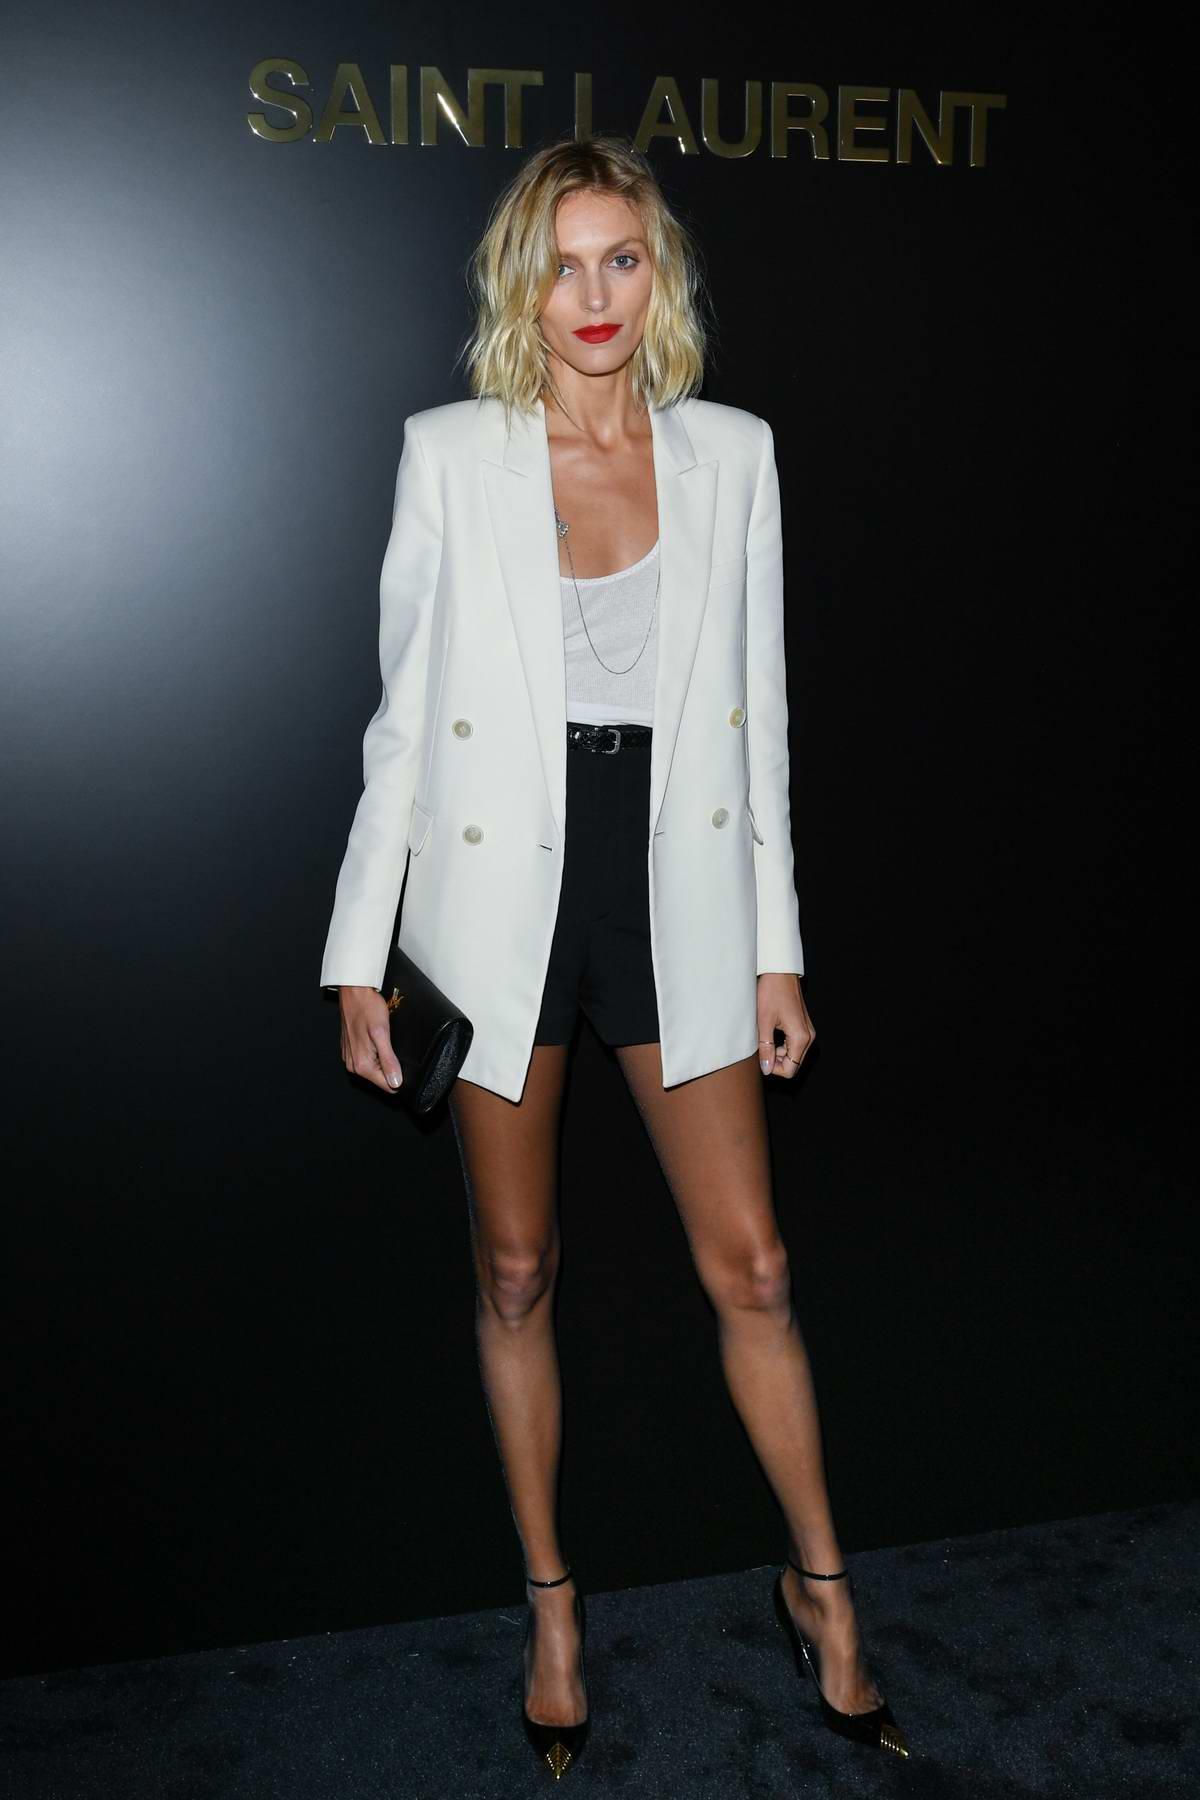 Anja Rubik attends the Saint Laurent show, F/W 2020 during Paris Fashion Week in Paris, France